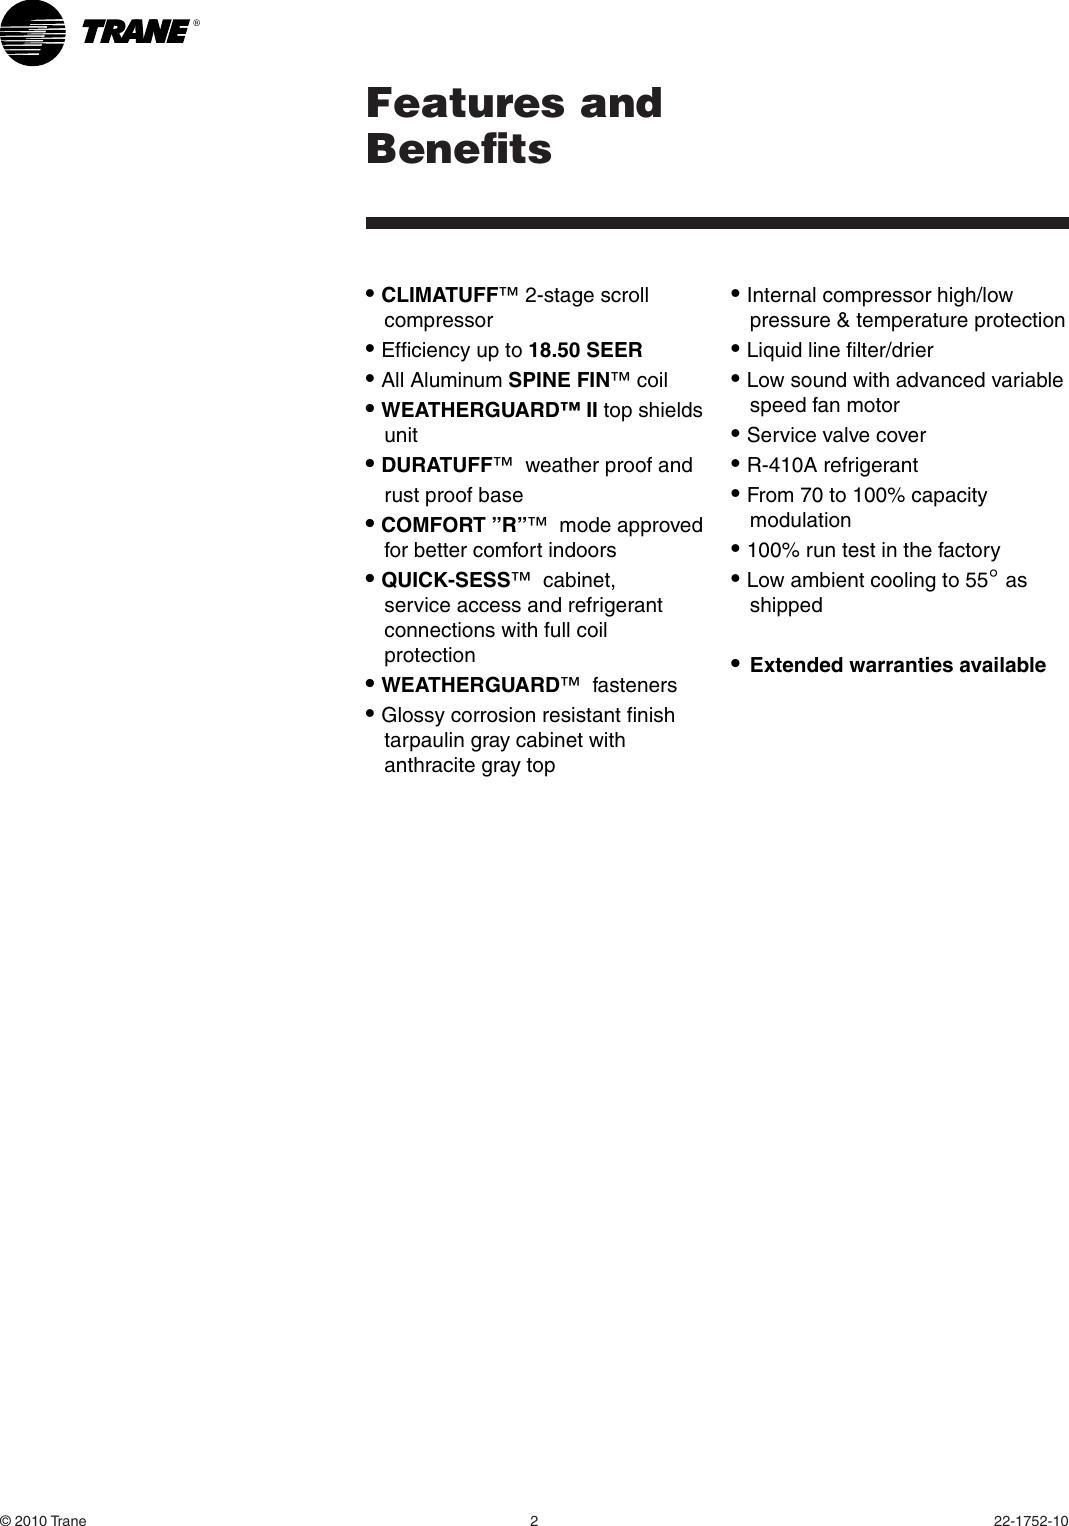 Trane 4Ttx6024 036 048 And 060E Users Manual 22 1752 10 10